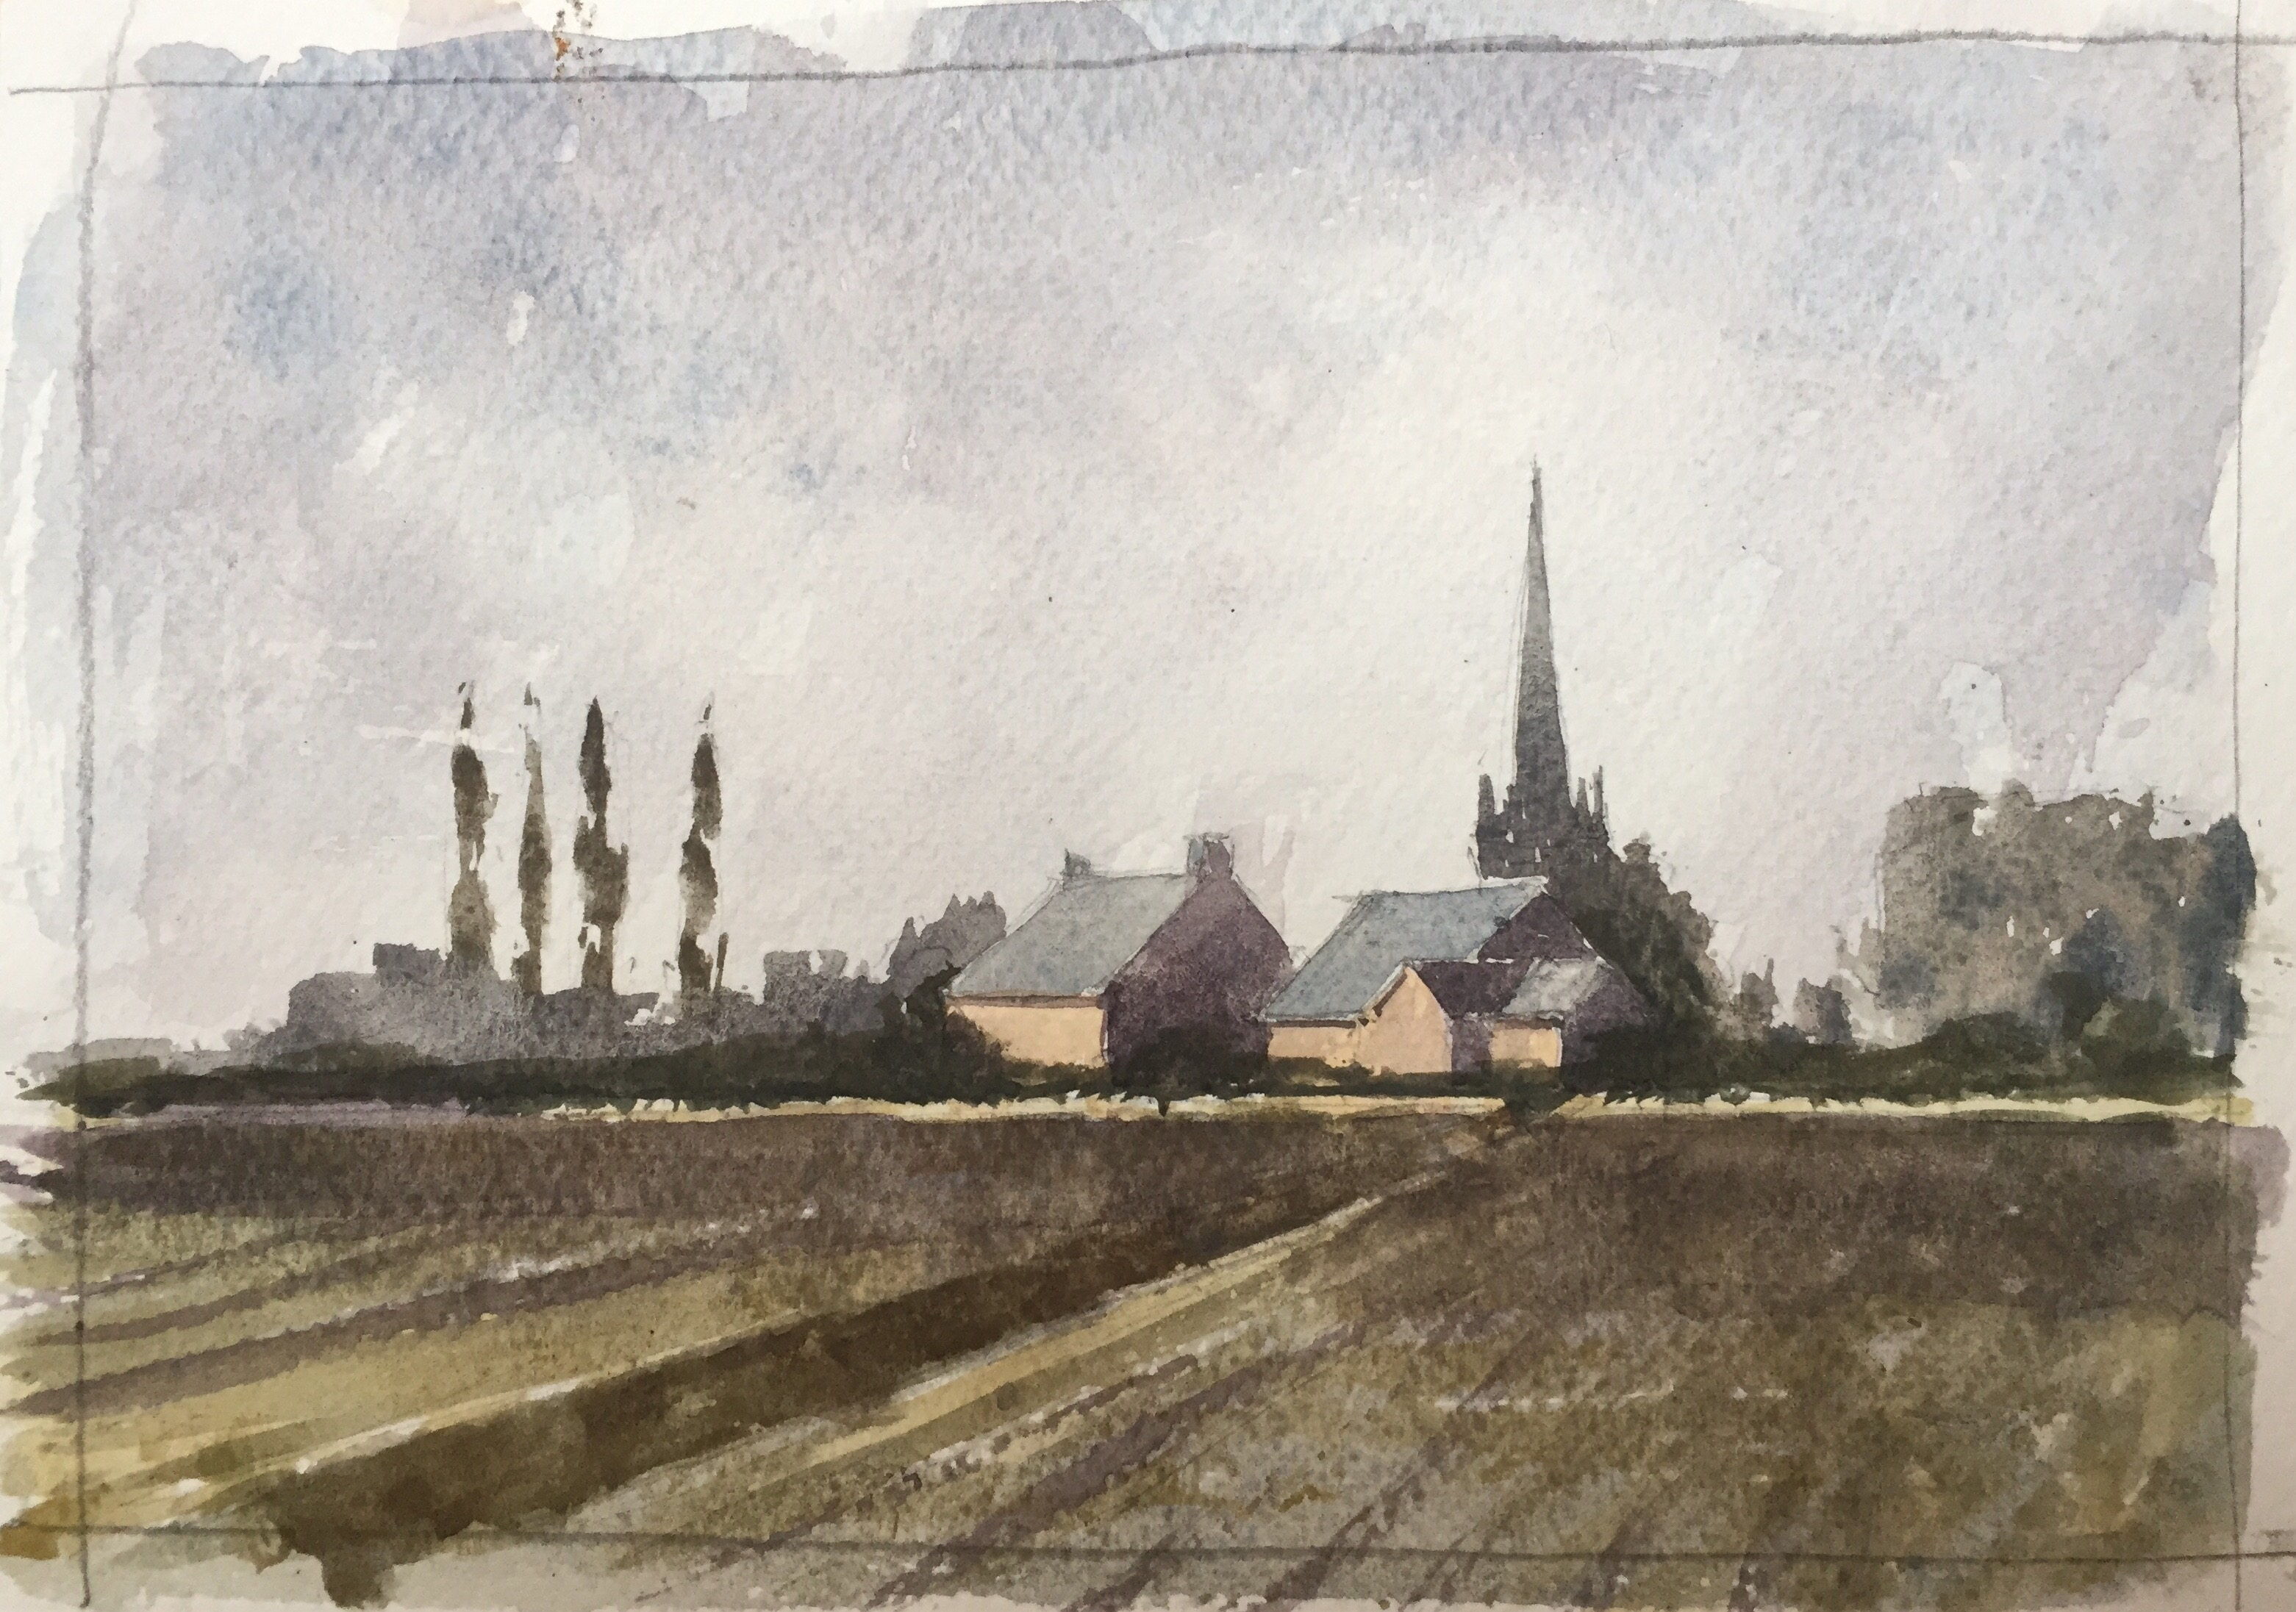 Watercolour sketch by John Haywood